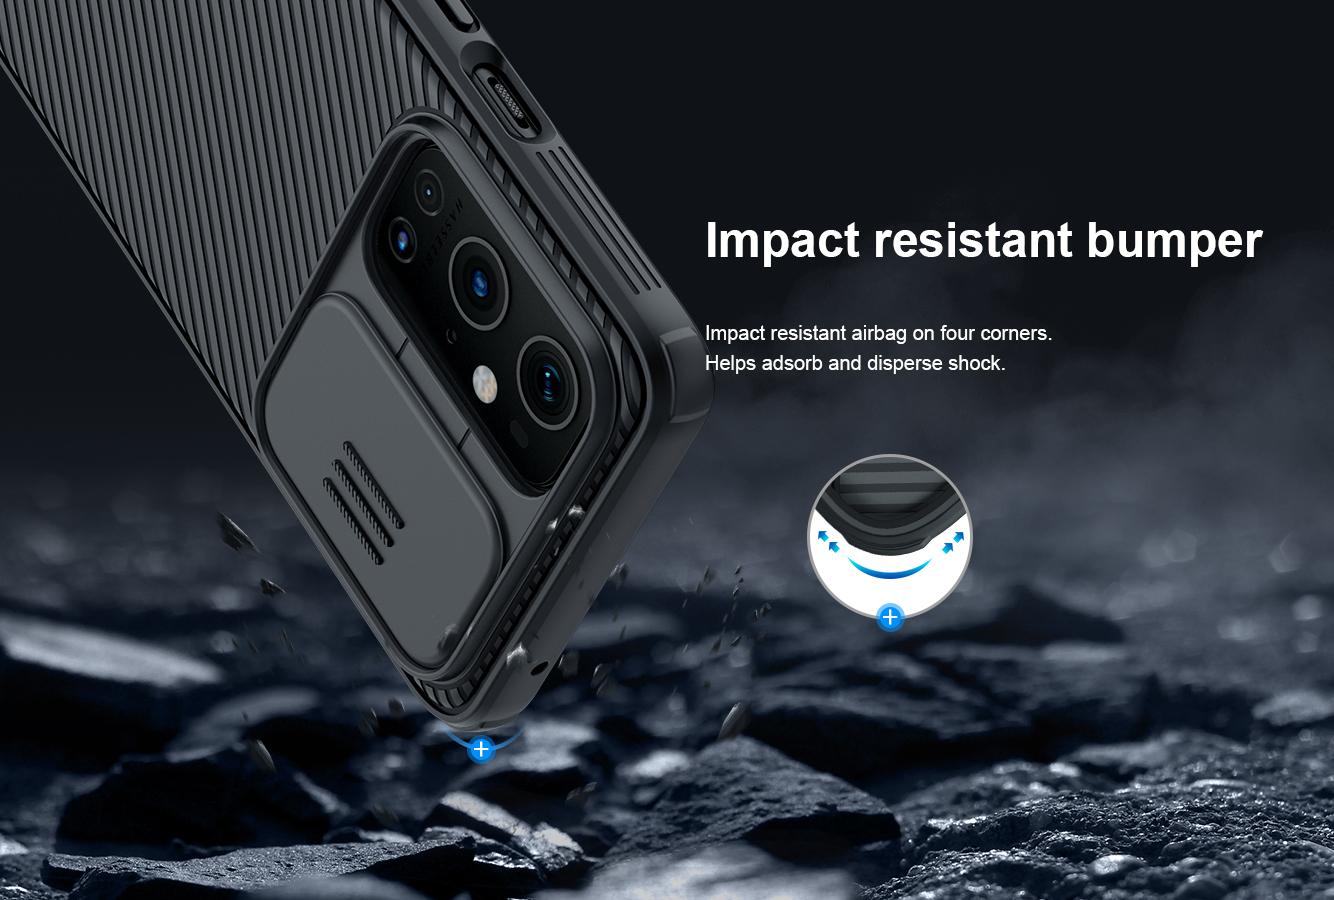 OnePlus_9_Pro_CamShield_Pro_Case-07.jpg